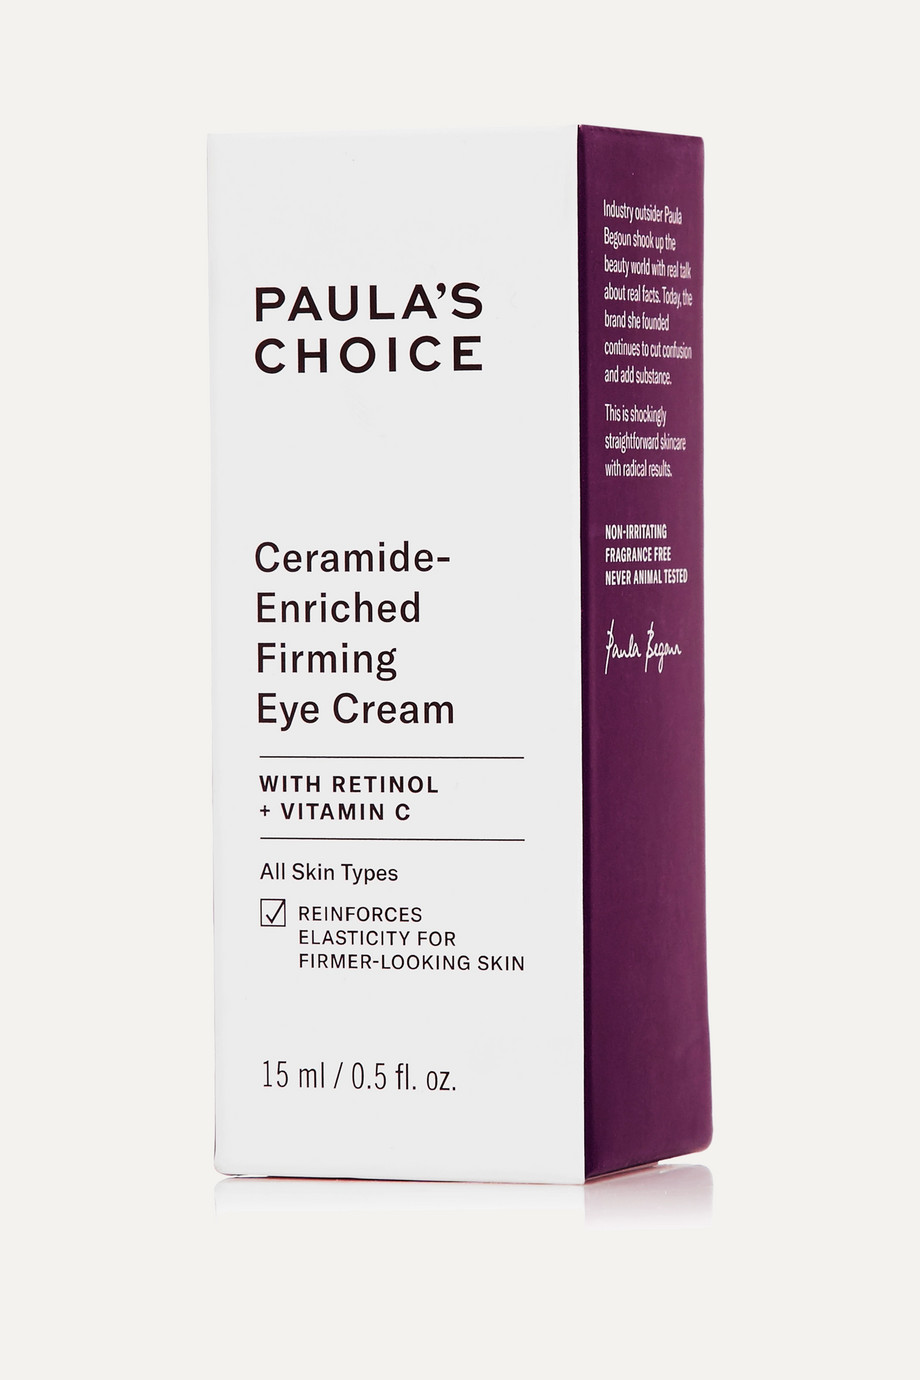 Paula's Choice Clinical Ceramide-Enriched Firming Eye Cream, 15 ml – Augencreme